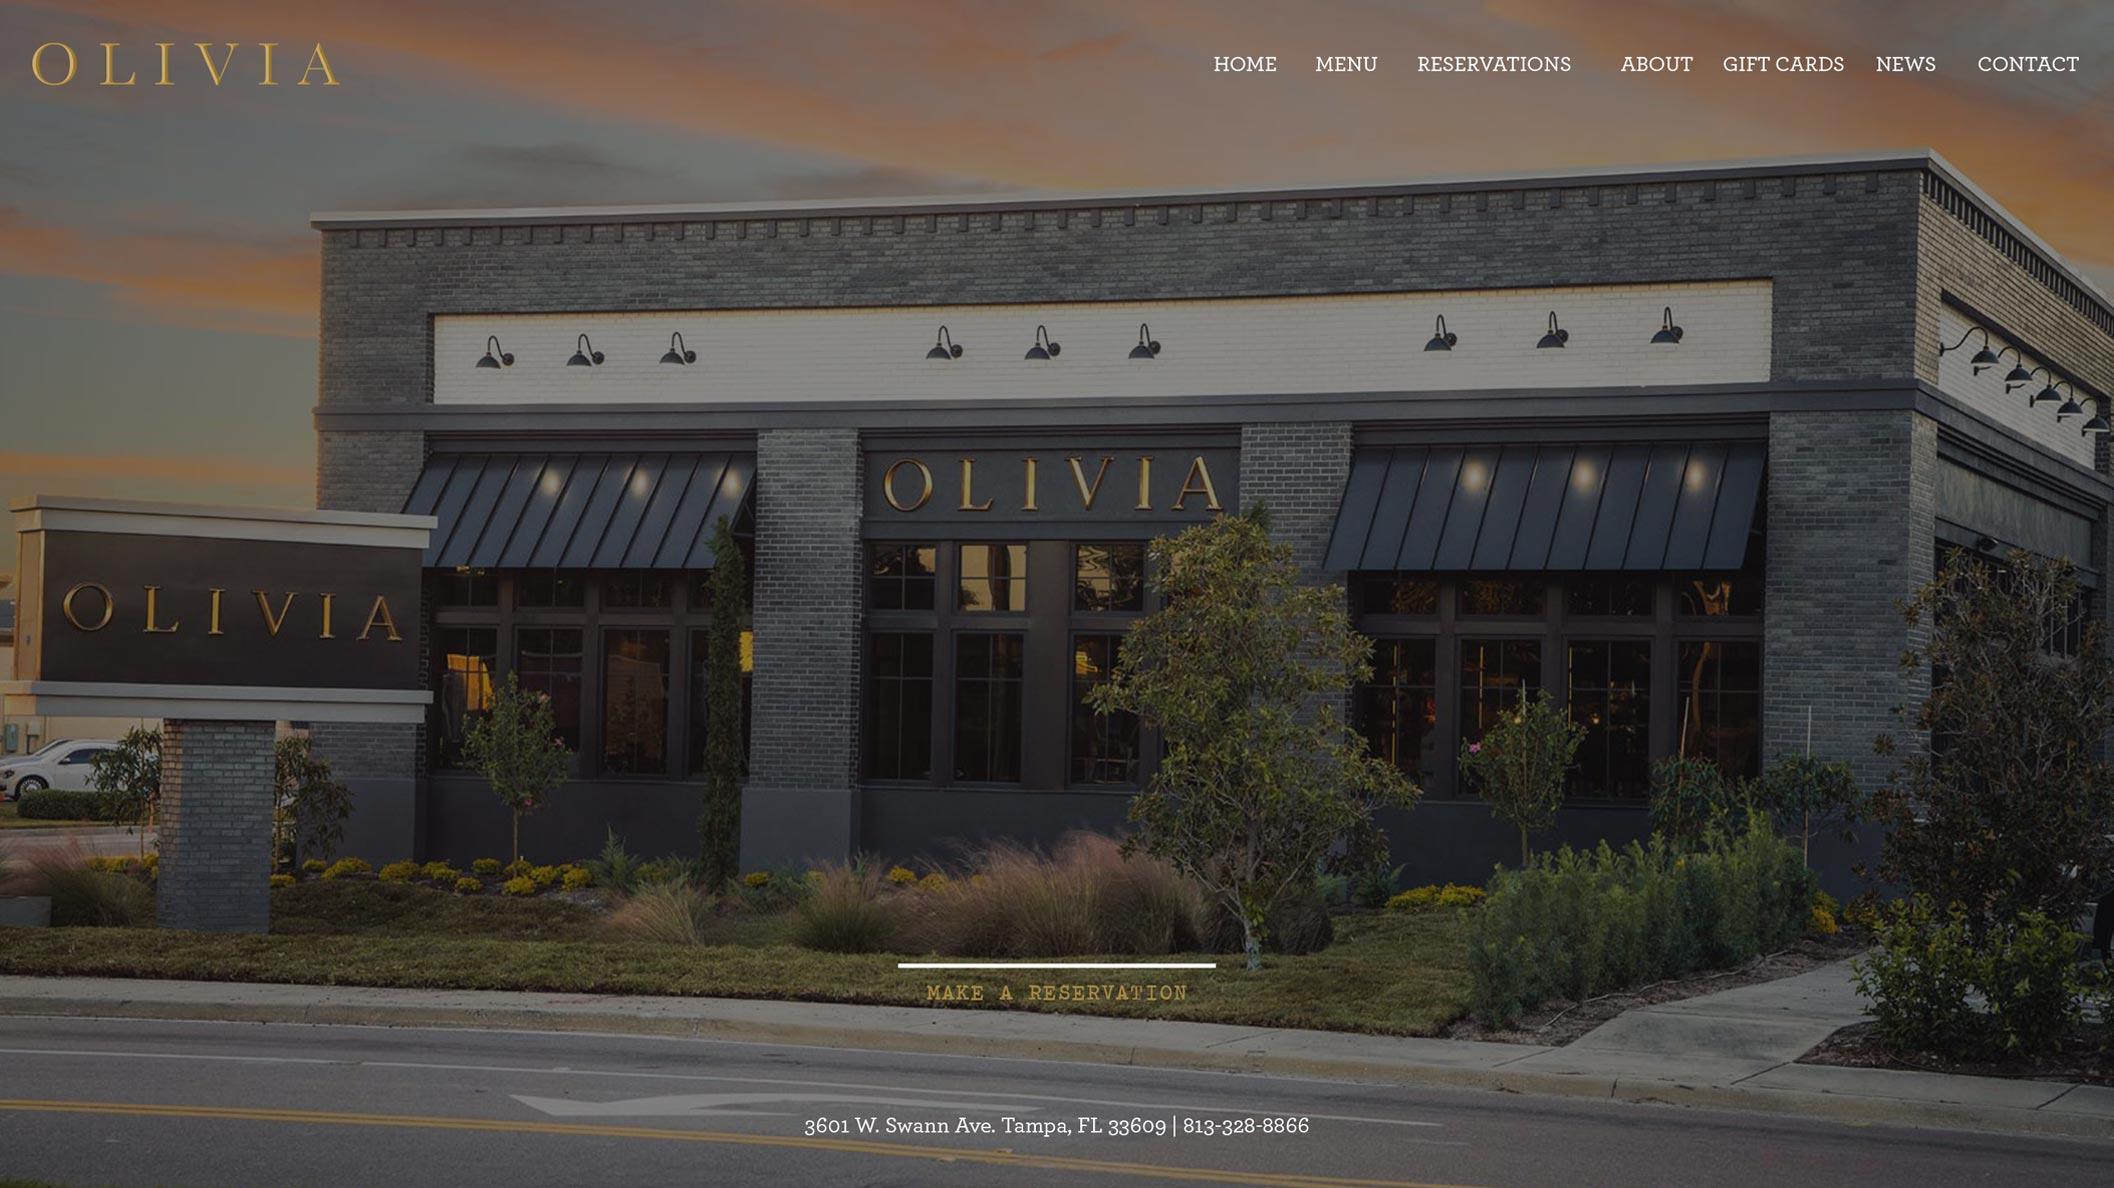 case-study-olivia-tampa-website-sky-compass-media